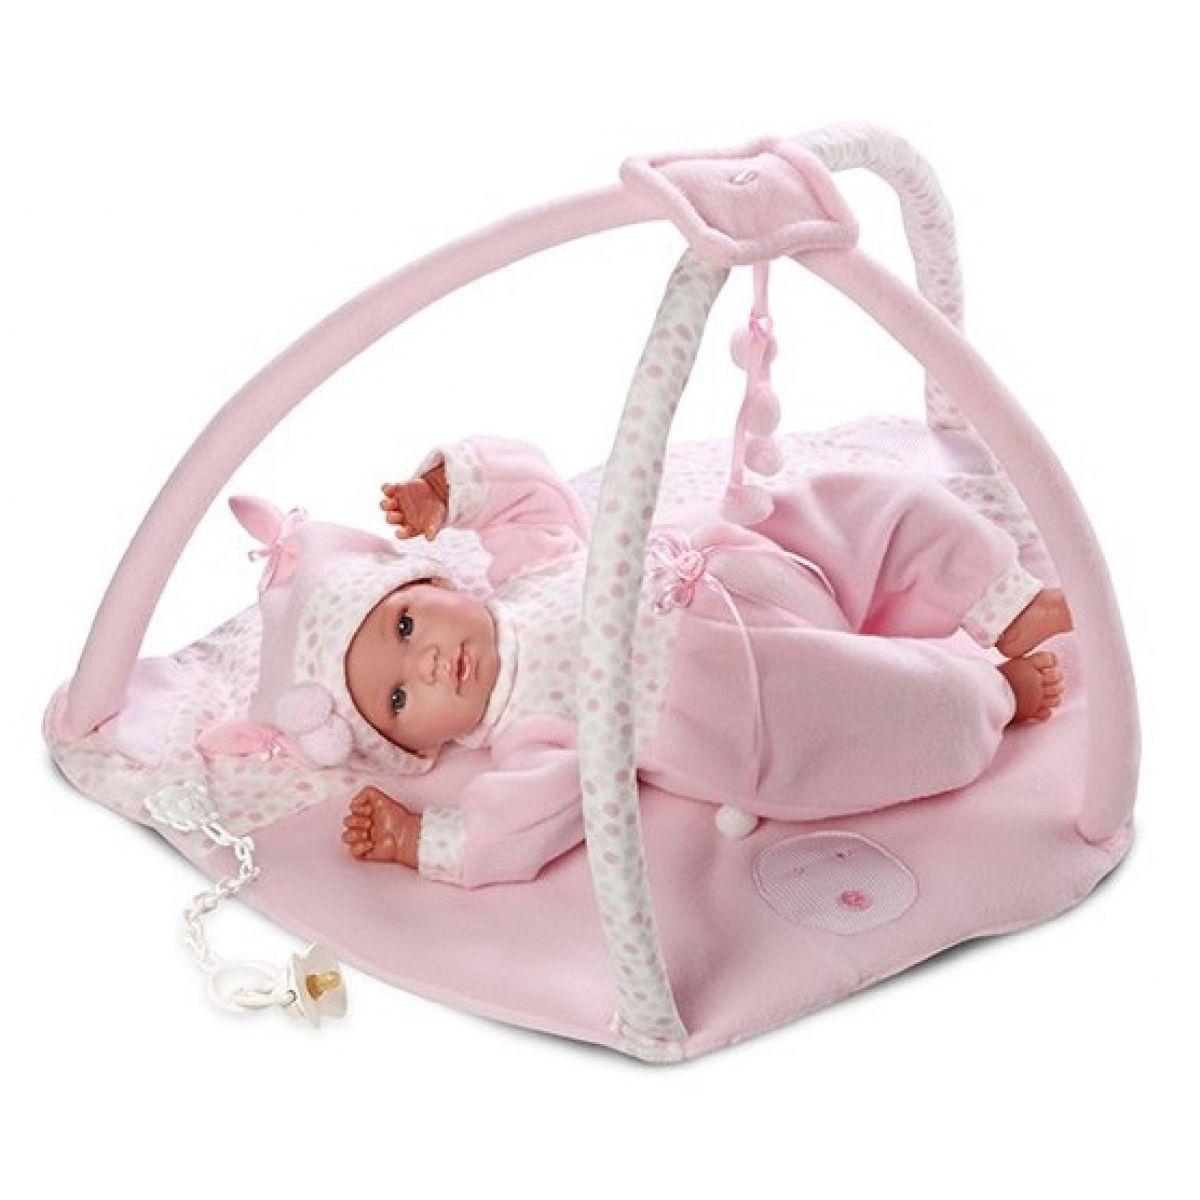 Llorens 63614 Panenka New Born s hrací dekou